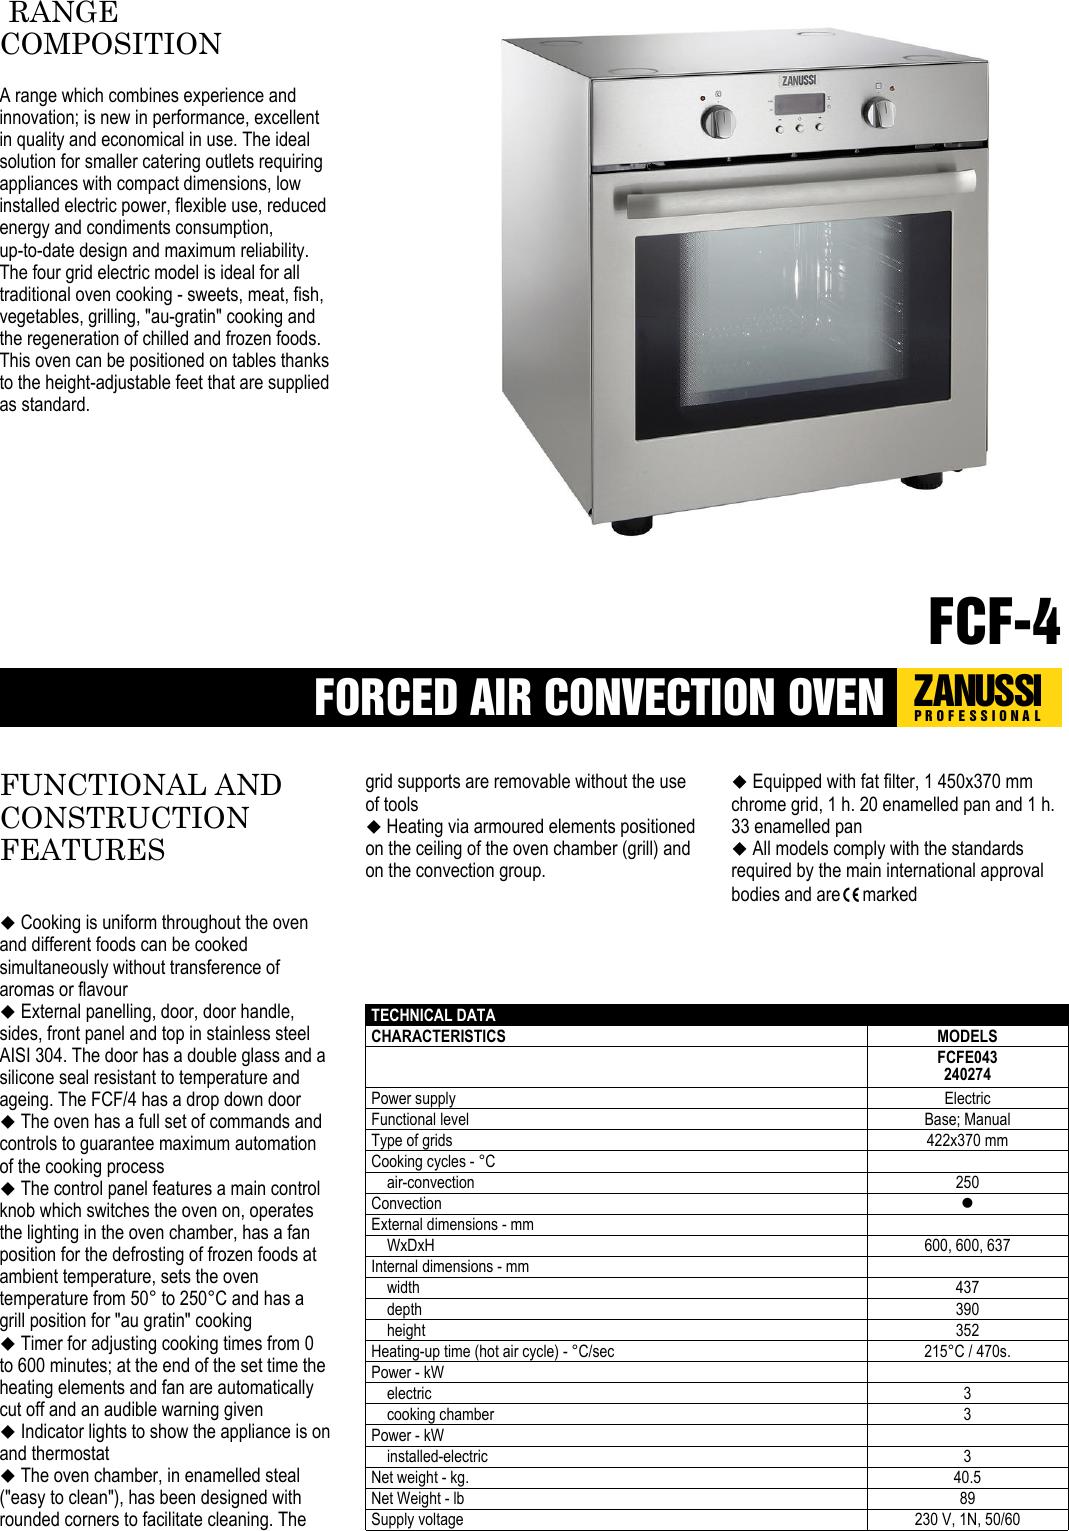 electrolux zanussi professional fcf 4 users manual forced air rh usermanual wiki electrolux double oven user guide electrolux icon oven user guide